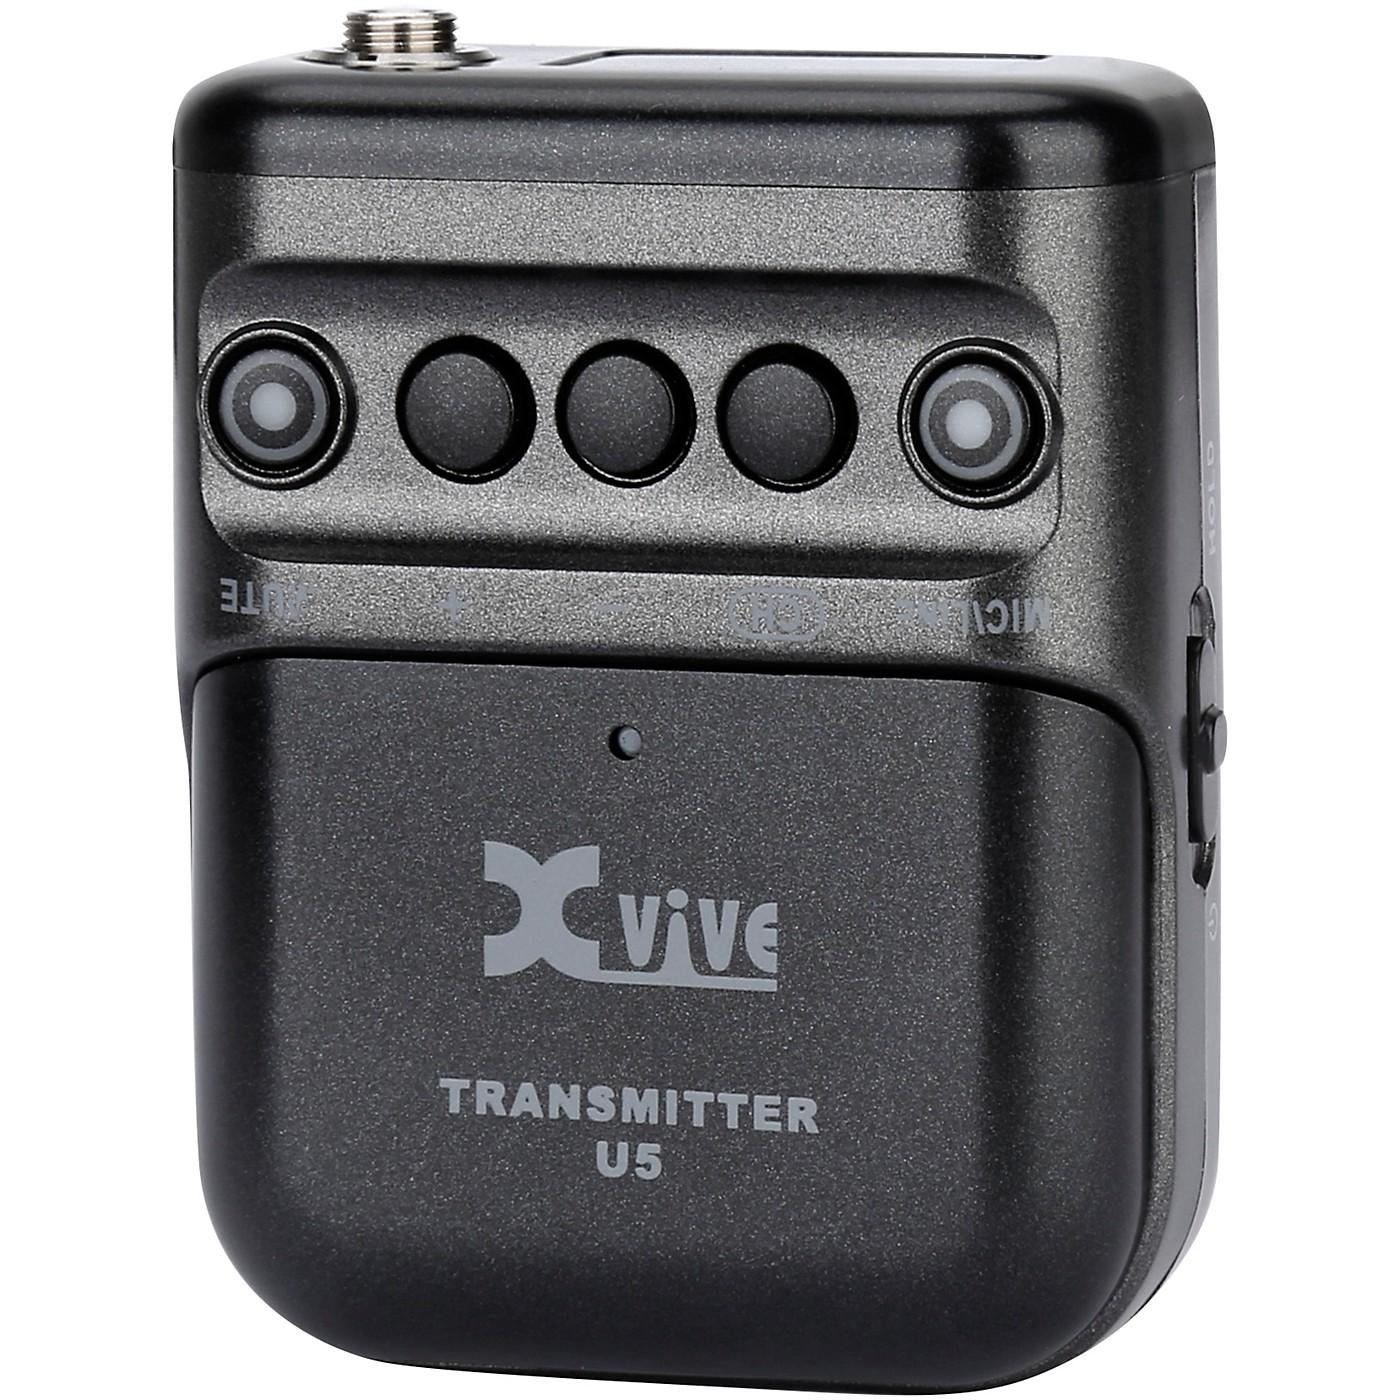 XVive U5T Wireless Transmitter (for U5 Series) thumbnail